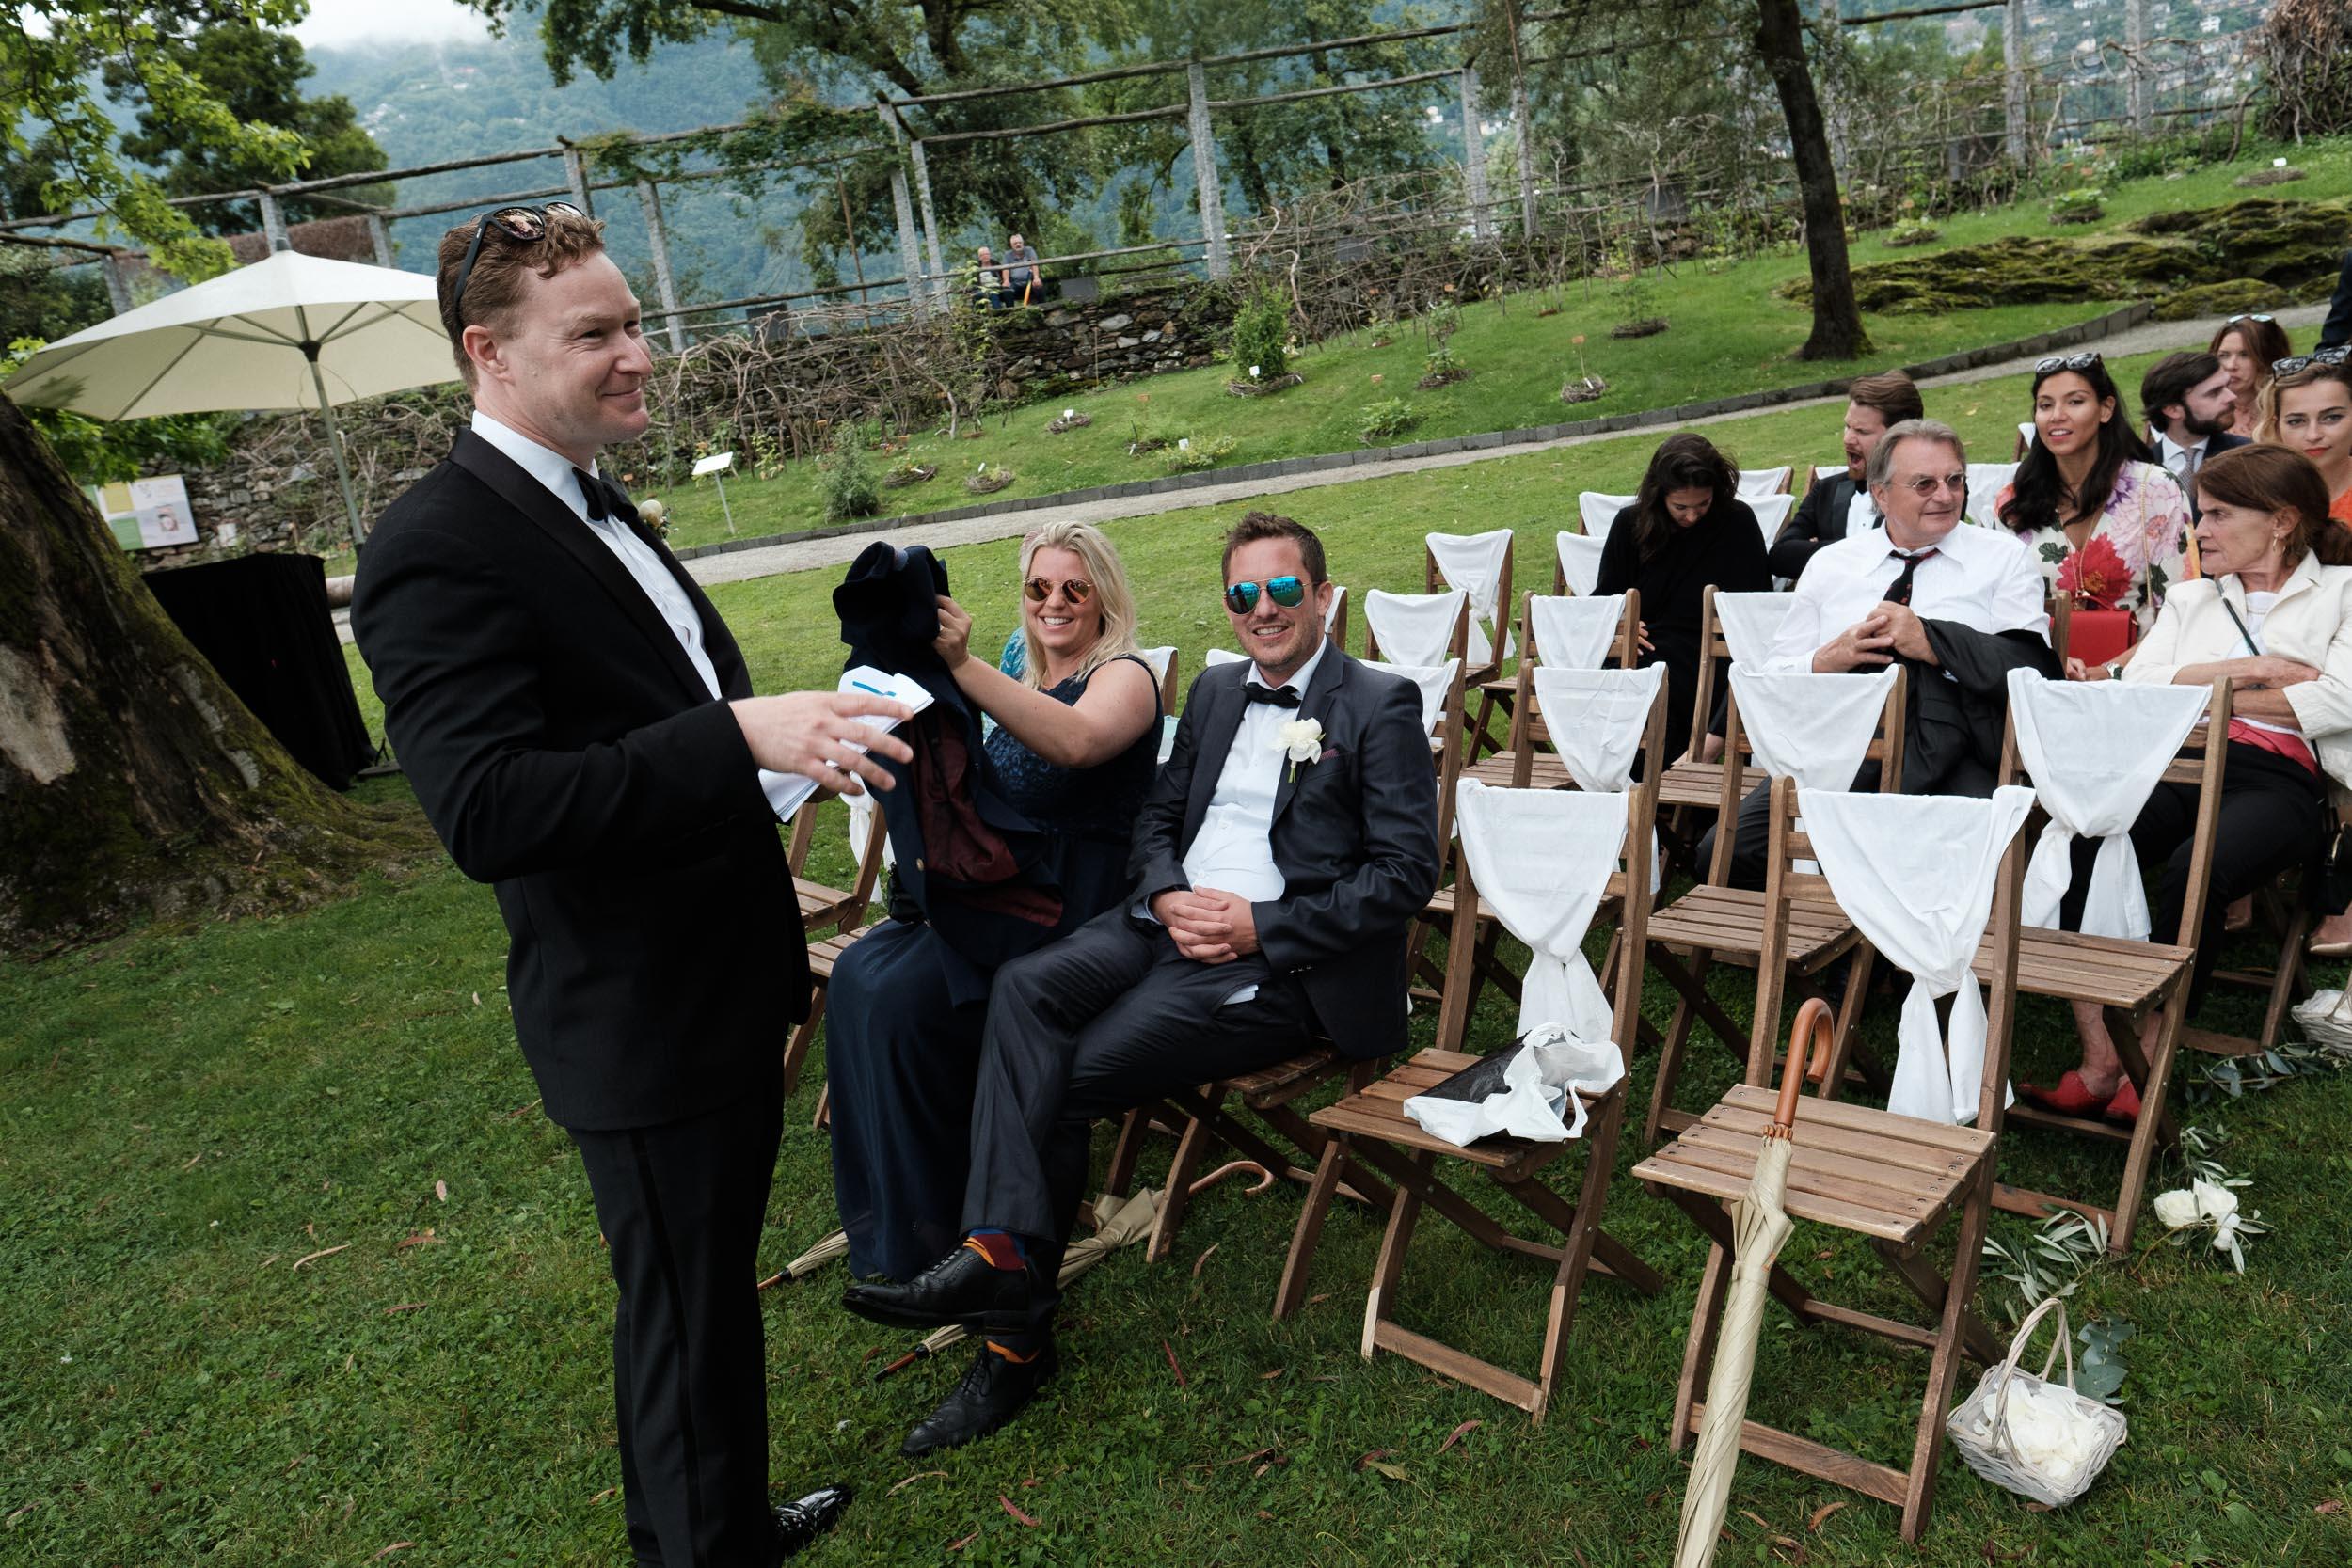 olivia-andreas-wedding-switzerland-271.jpg